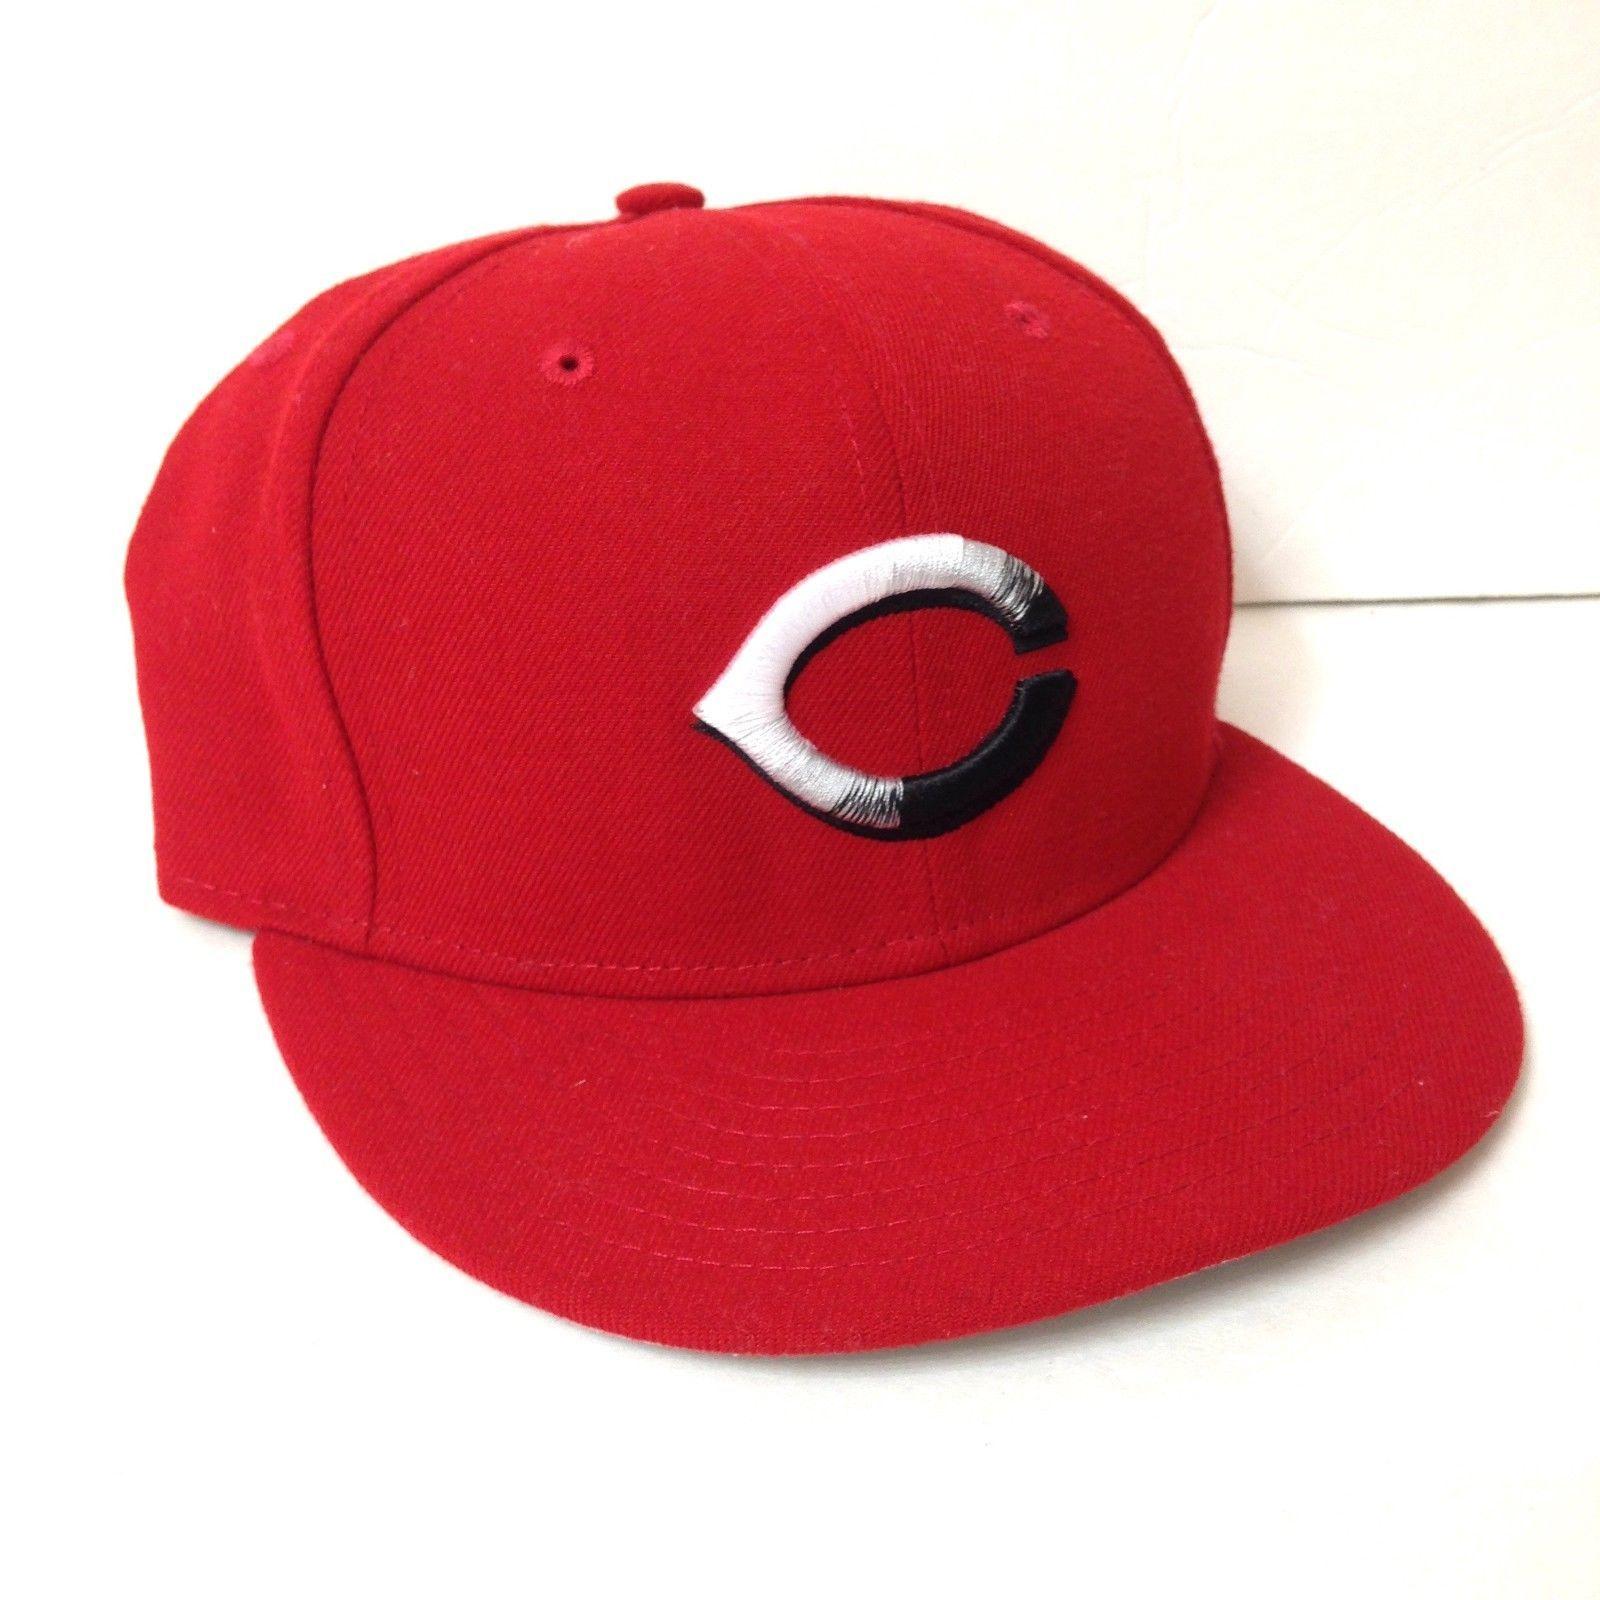 6d08ed37f7a ... vintage 1969 hat cap adjustable baseball black c0a80 f7008 spain new 28 cincinnati  reds snapback hat color dim c logo new era 9fifty men women ...